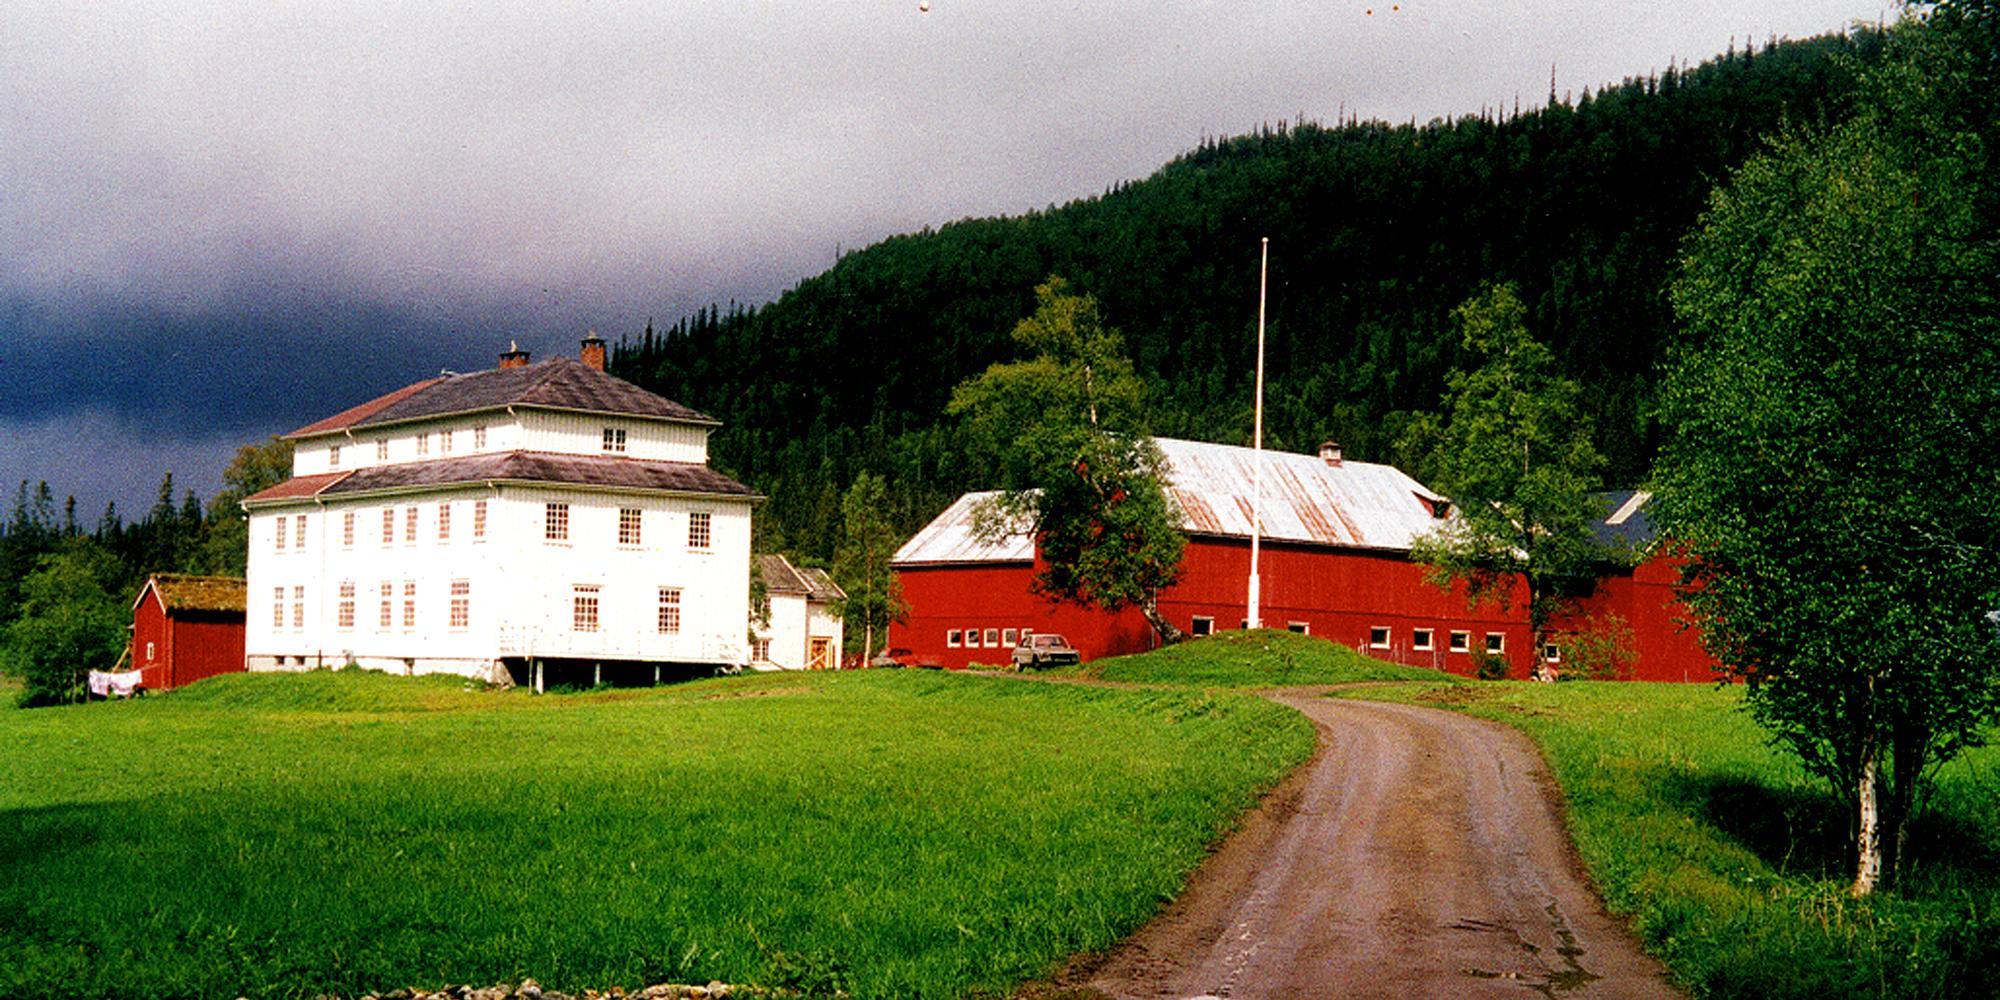 Mokk gård. Copyright: Mokk gård